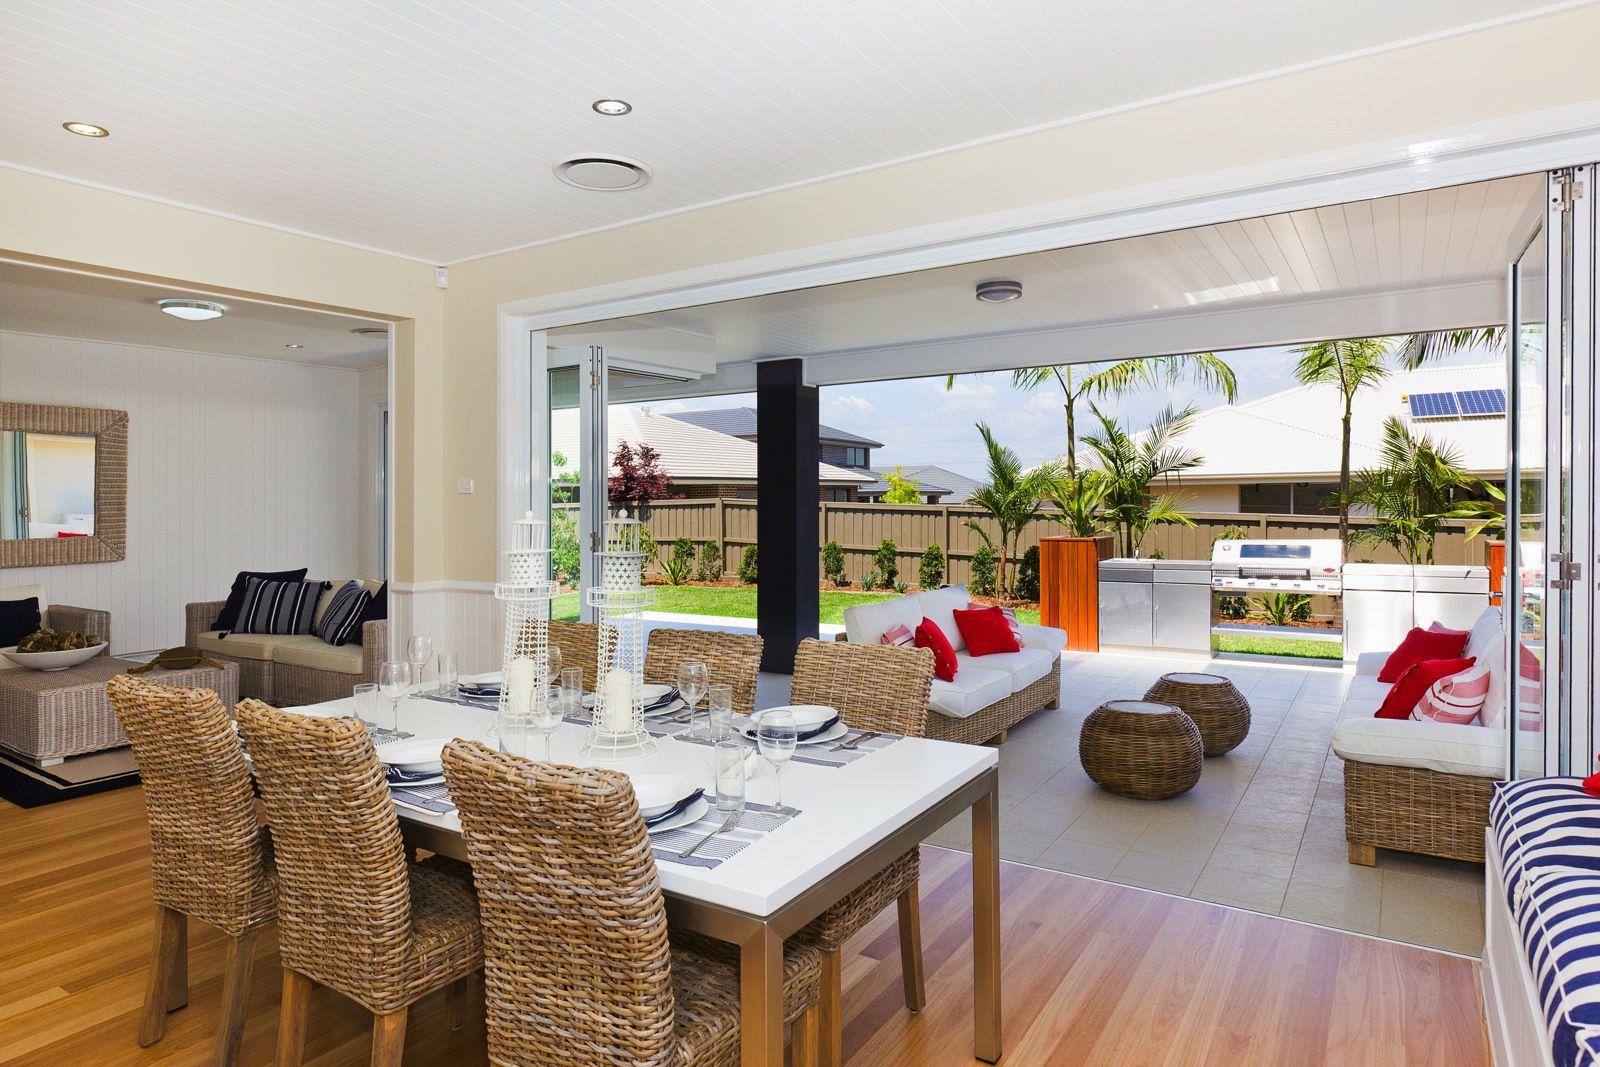 indoor outdoor living - Google Search | Timber flooring ... on Outdoor Living Ltd id=50206